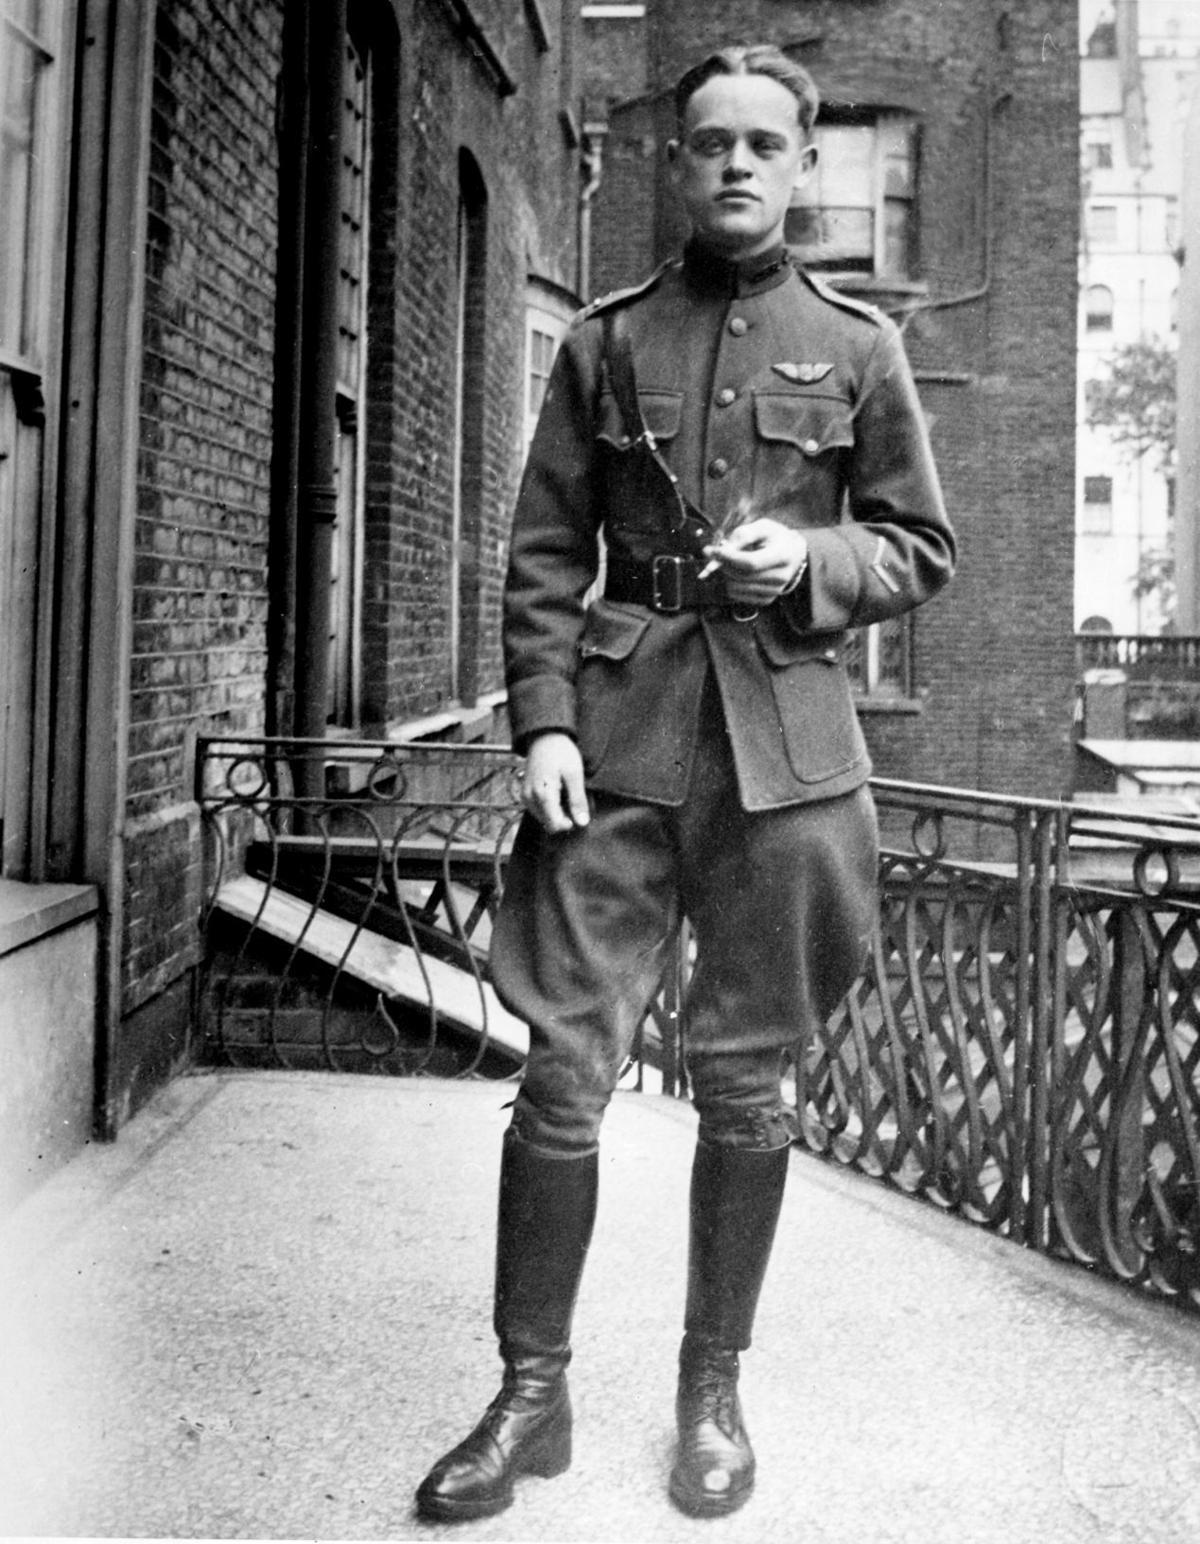 Jarvis Offutt in uniform